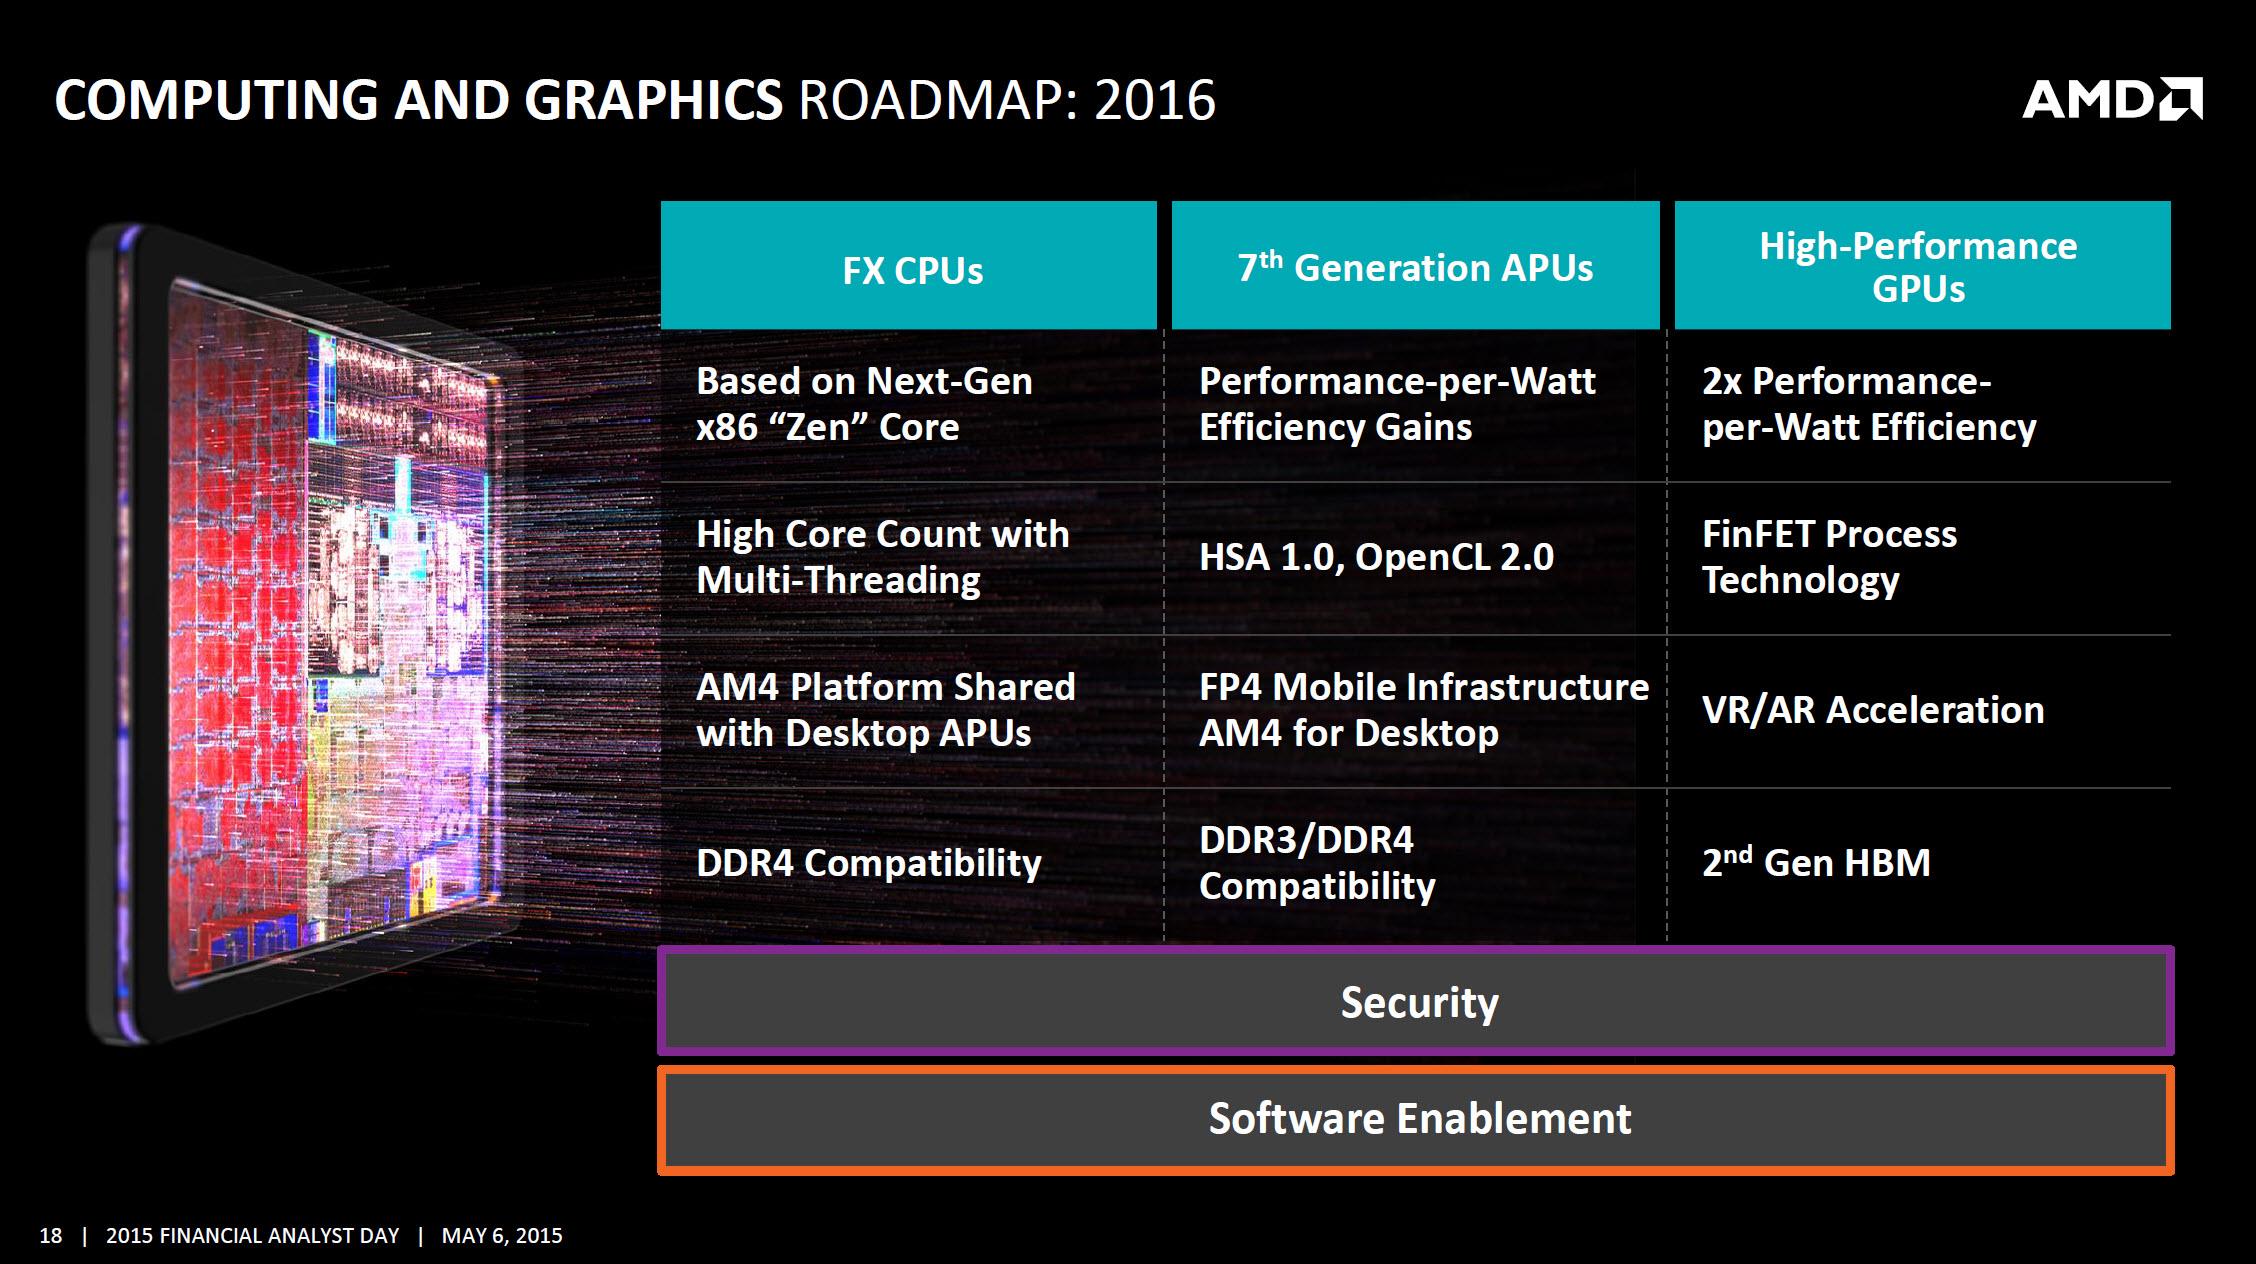 Amd Confirms X86 Zen Based Enthusiast Fx Cpus And 7th Generation Vga Card Buldozer Ddr3 Computing Roadmap 2016 Apus Gpus